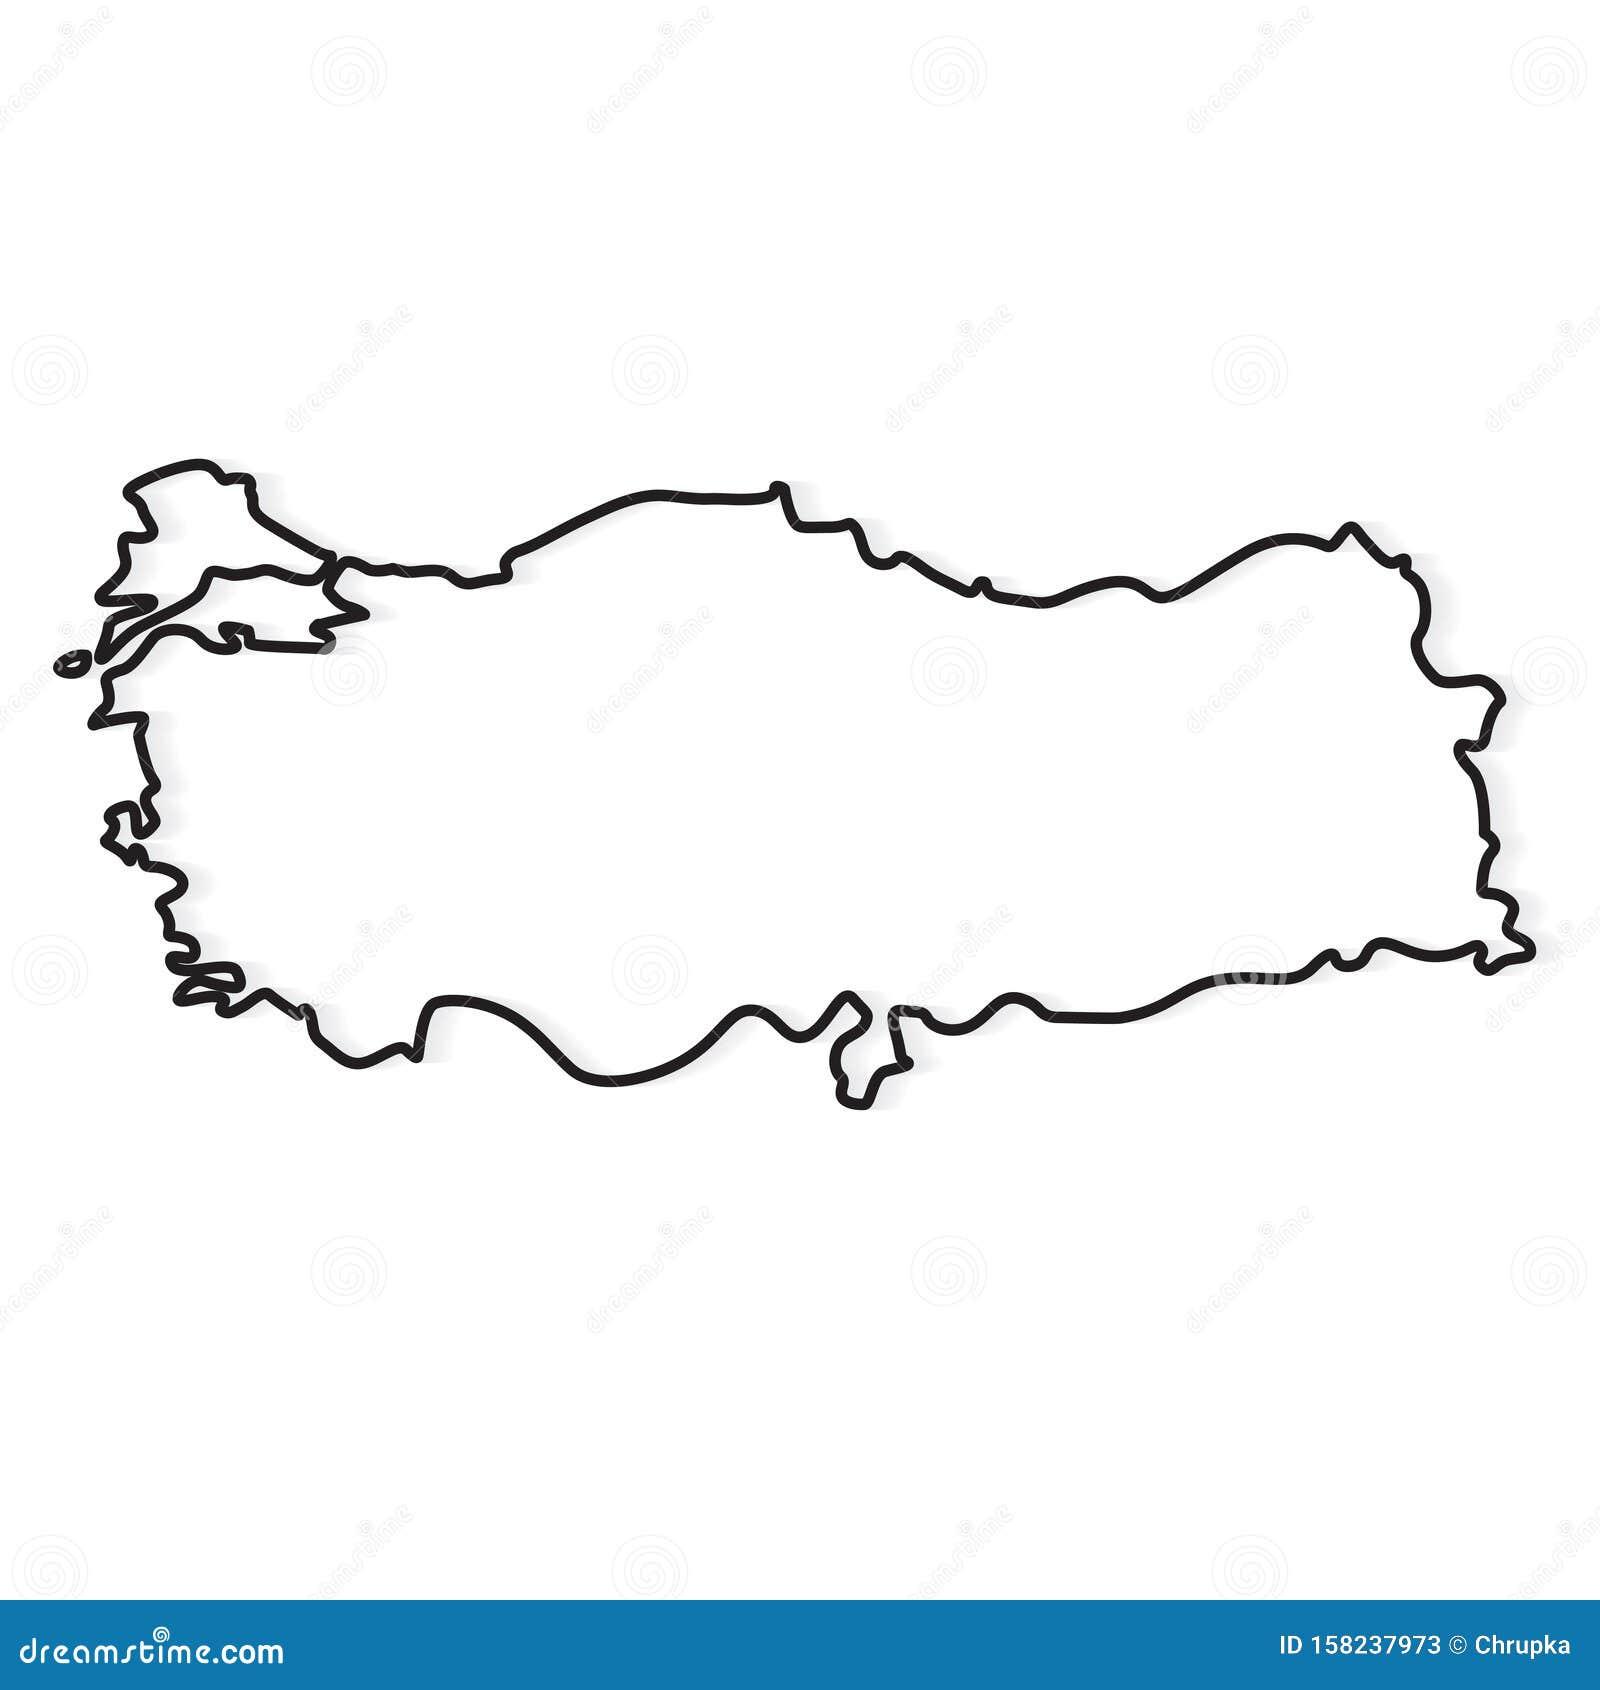 Black Outline Of Turkey Map Stock Vector - Illustration of ...